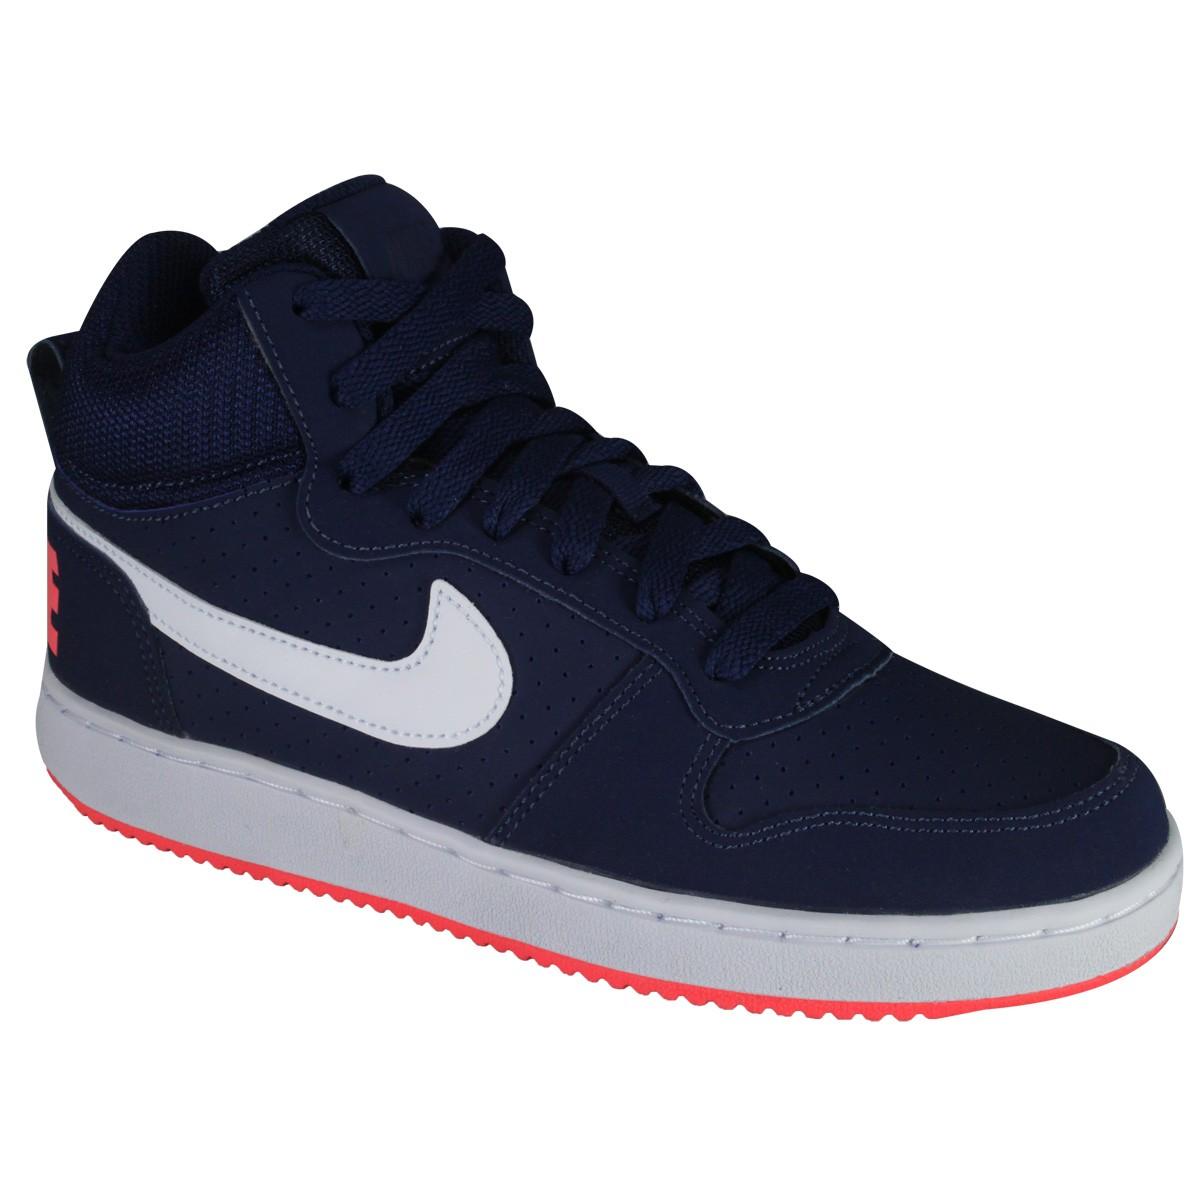 02a84f5098ddc Tênis Nike WMNS Court Borough Mid 844906-401 Marinho Rosa